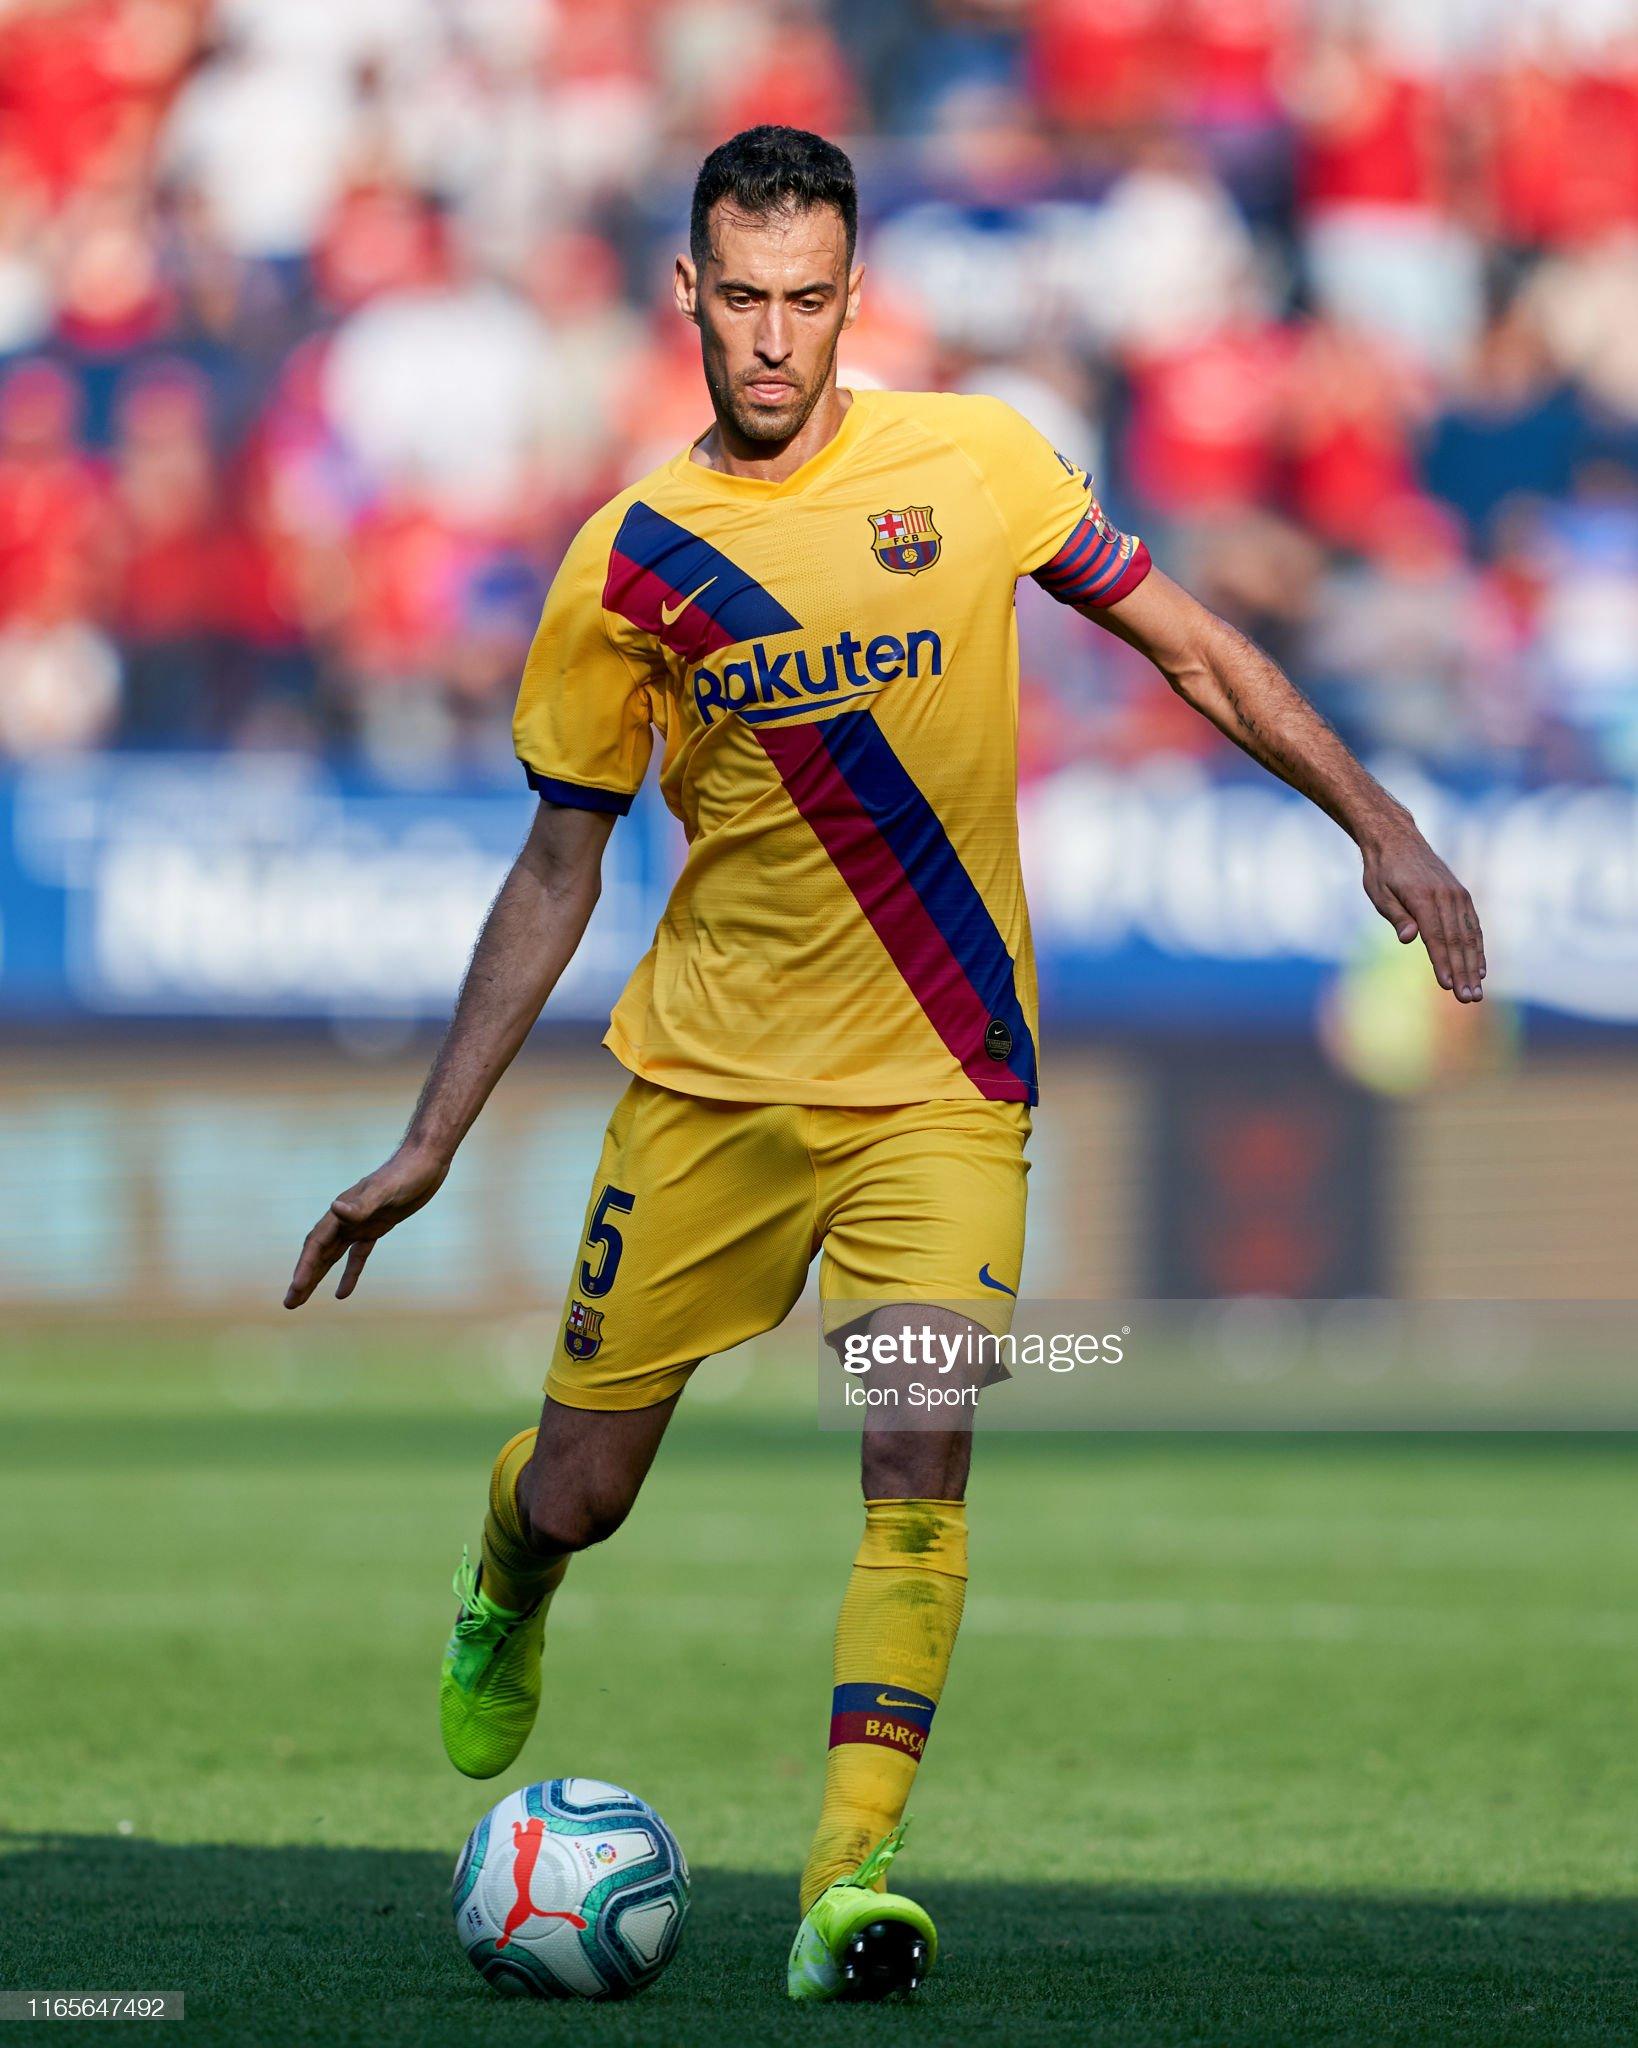 صور مباراة : أوساسونا - برشلونة 2-2 ( 31-08-2019 )  Sergio-busquets-of-fc-barcelona-during-the-liga-match-between-osasuna-picture-id1165647492?s=2048x2048